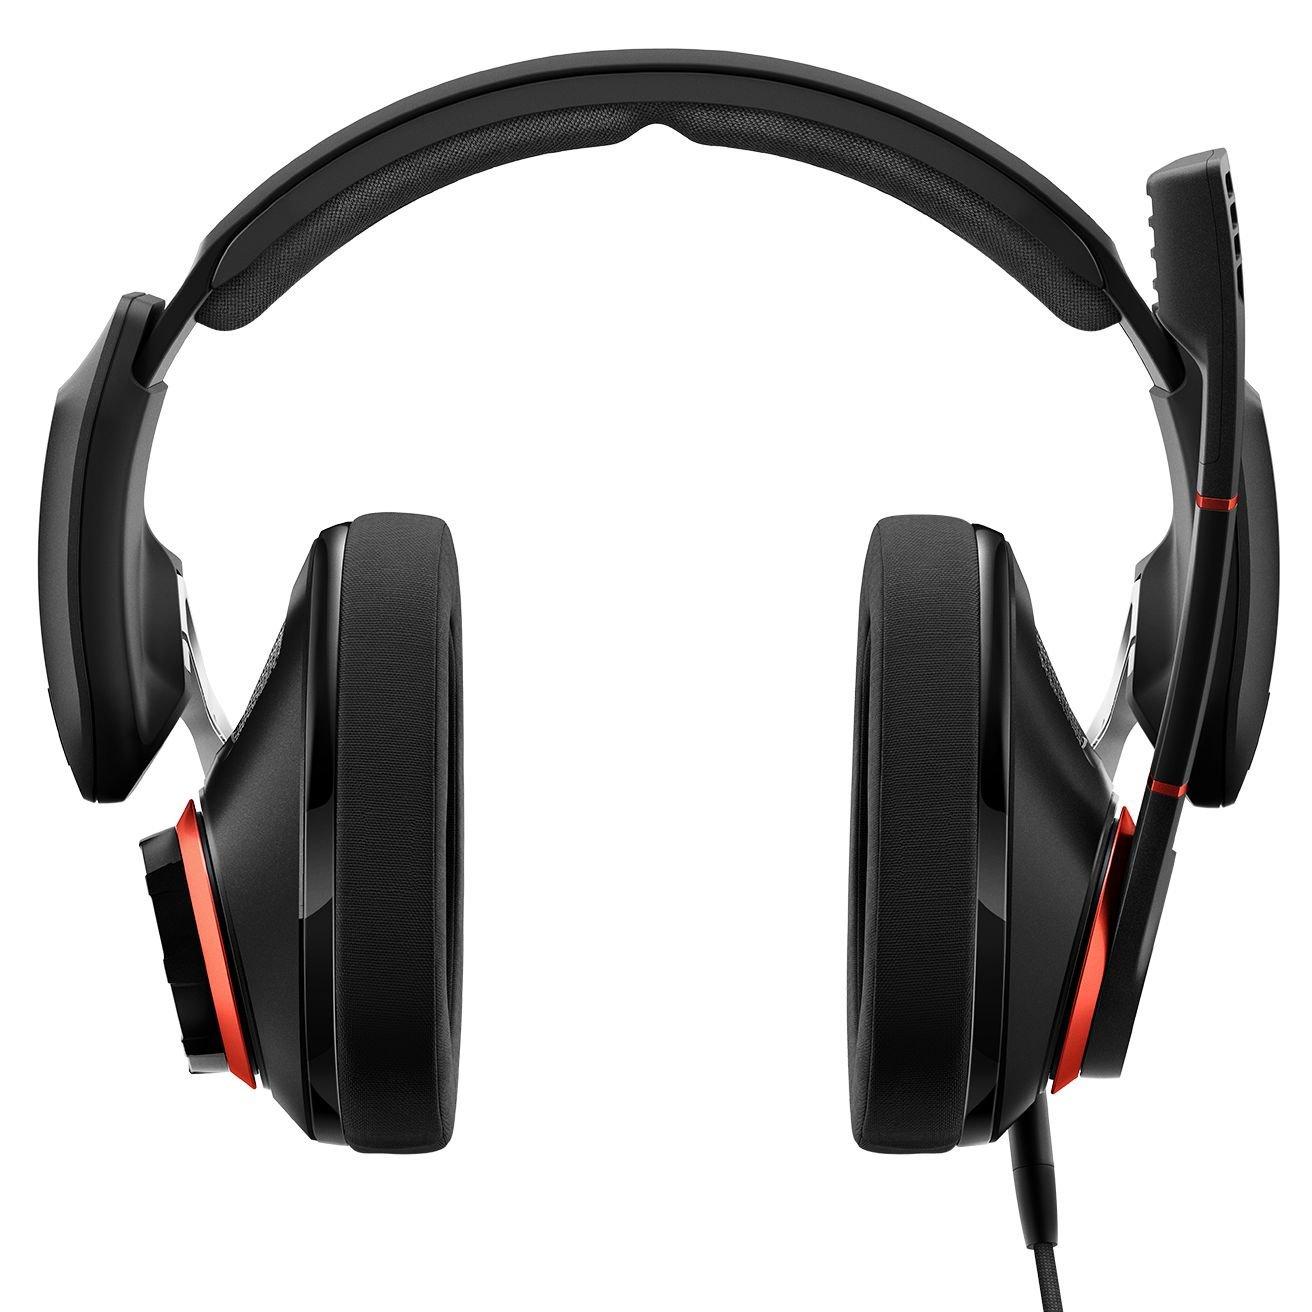 EPOS Sennheiser GSP 500 Gaming Headset for  image